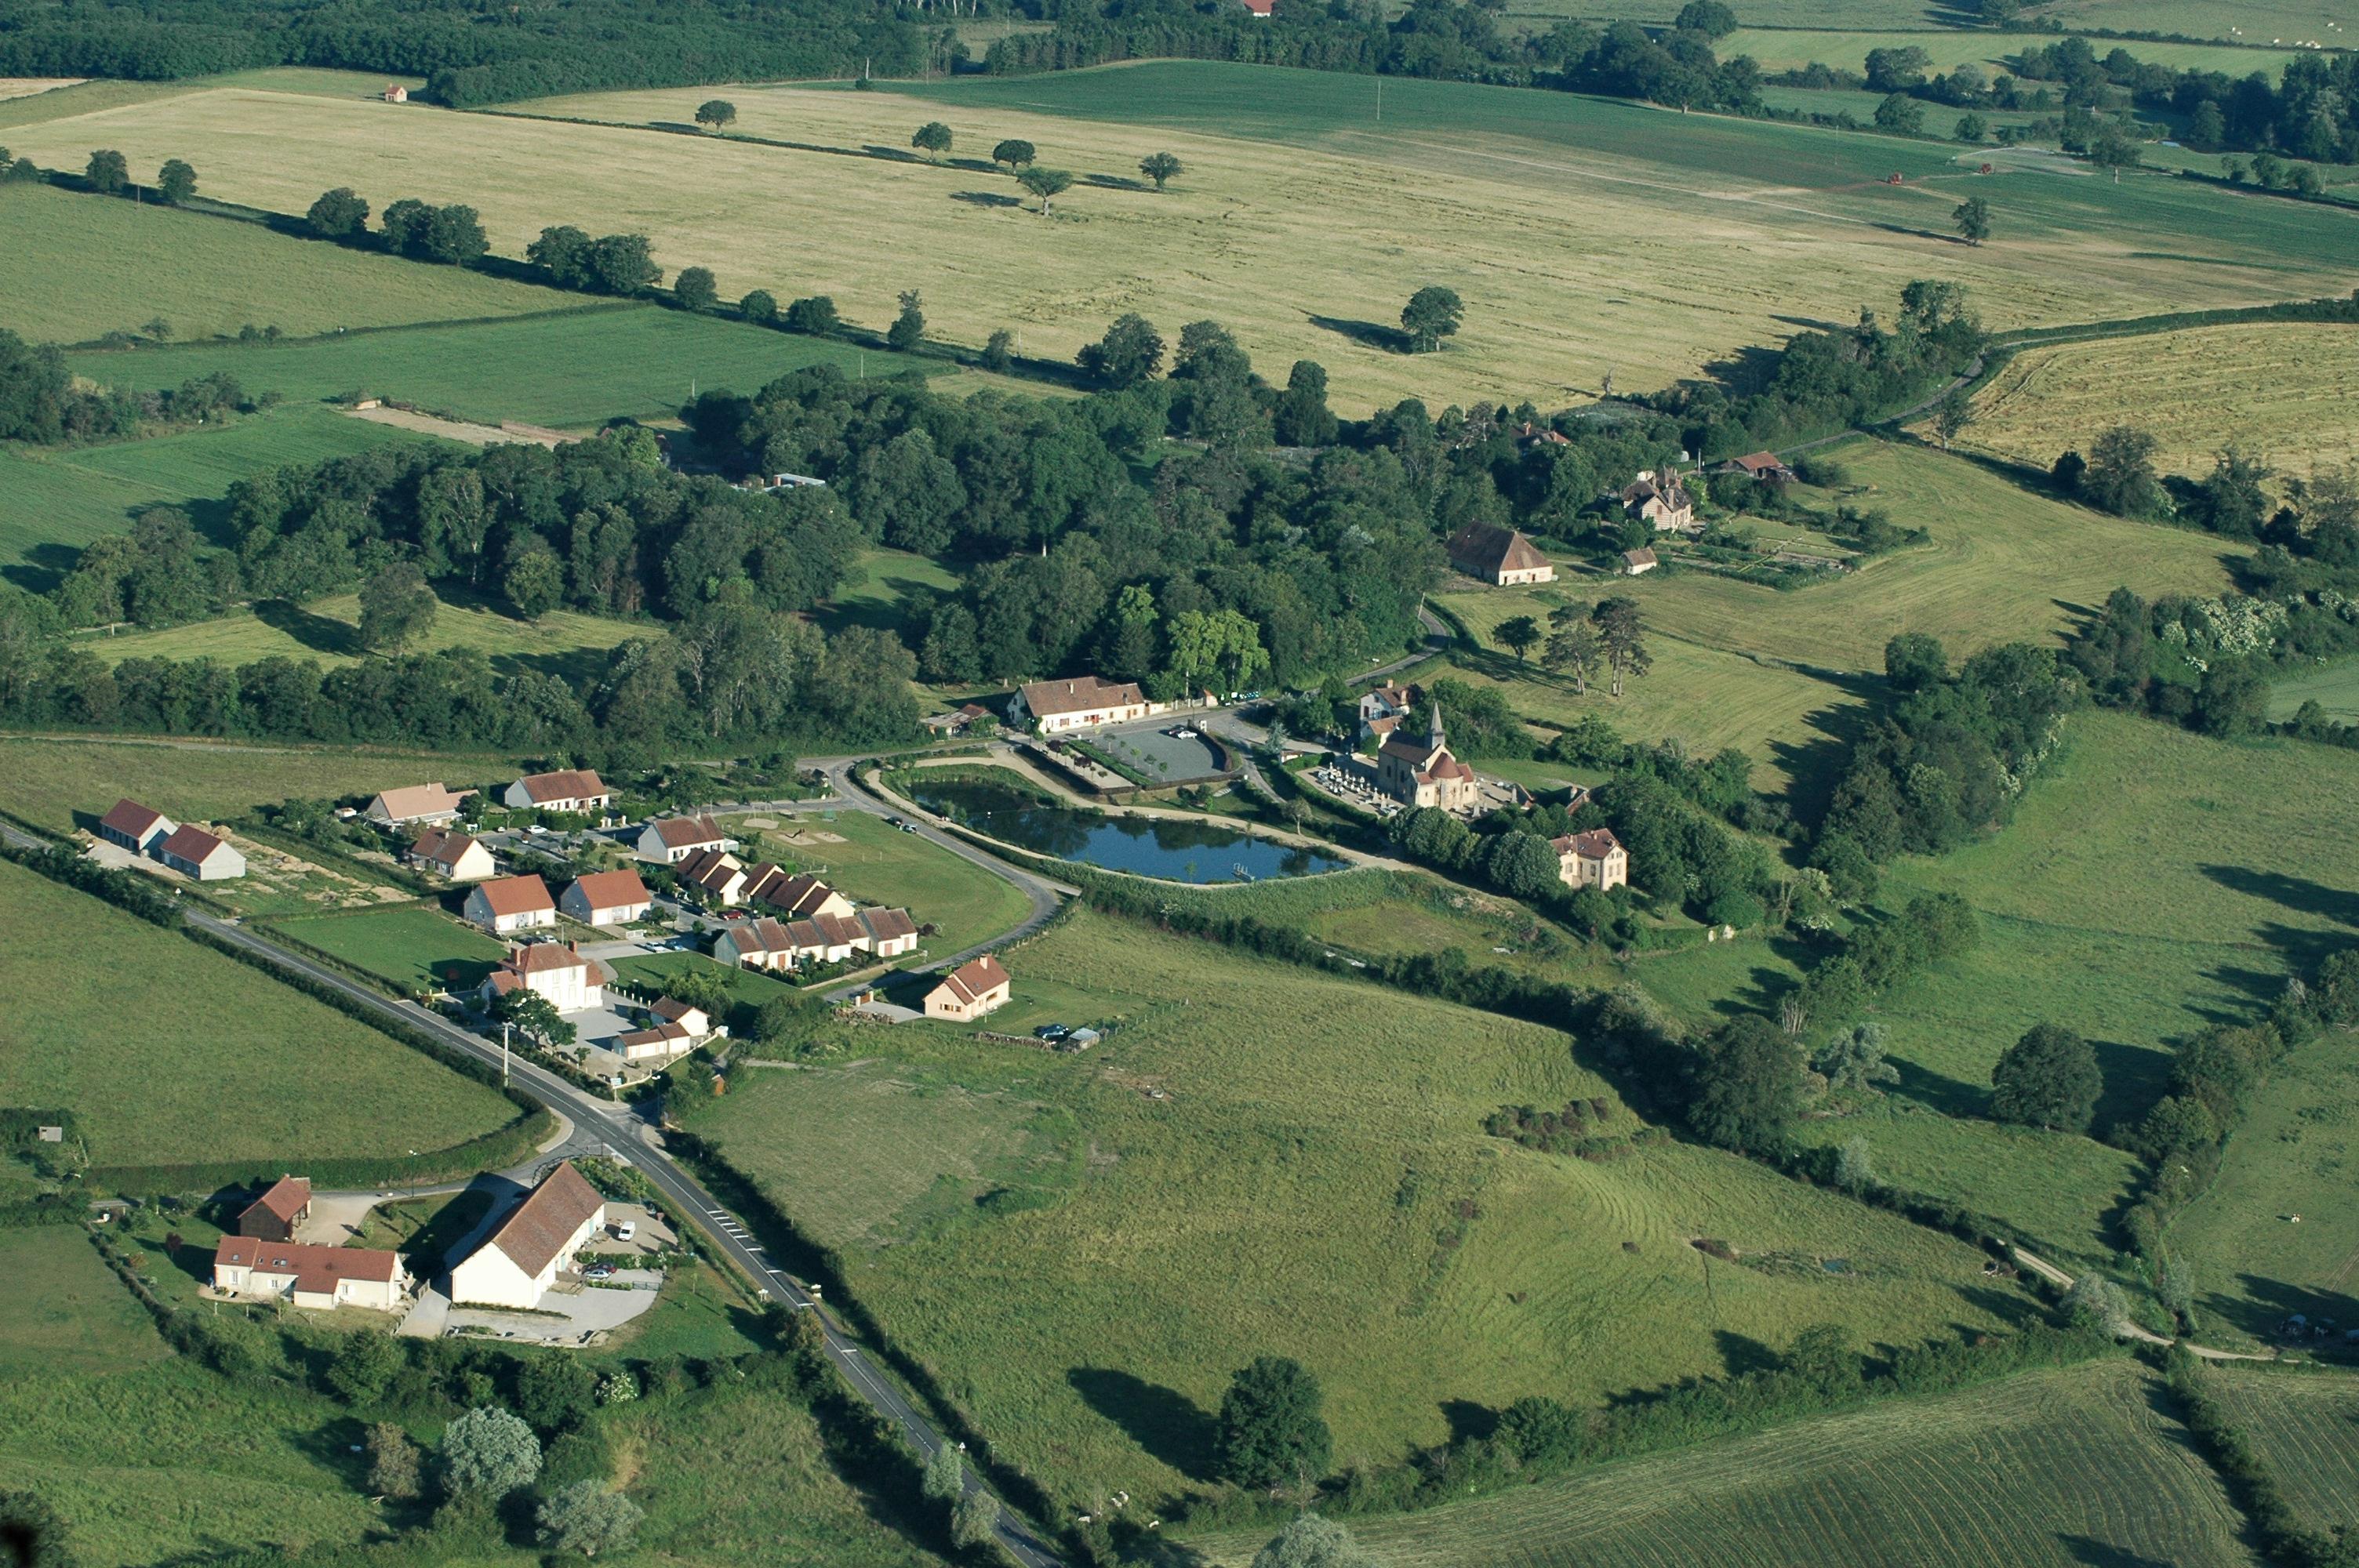 File:Aerial view Aubigny Allier.jpg - Wikimedia Commons